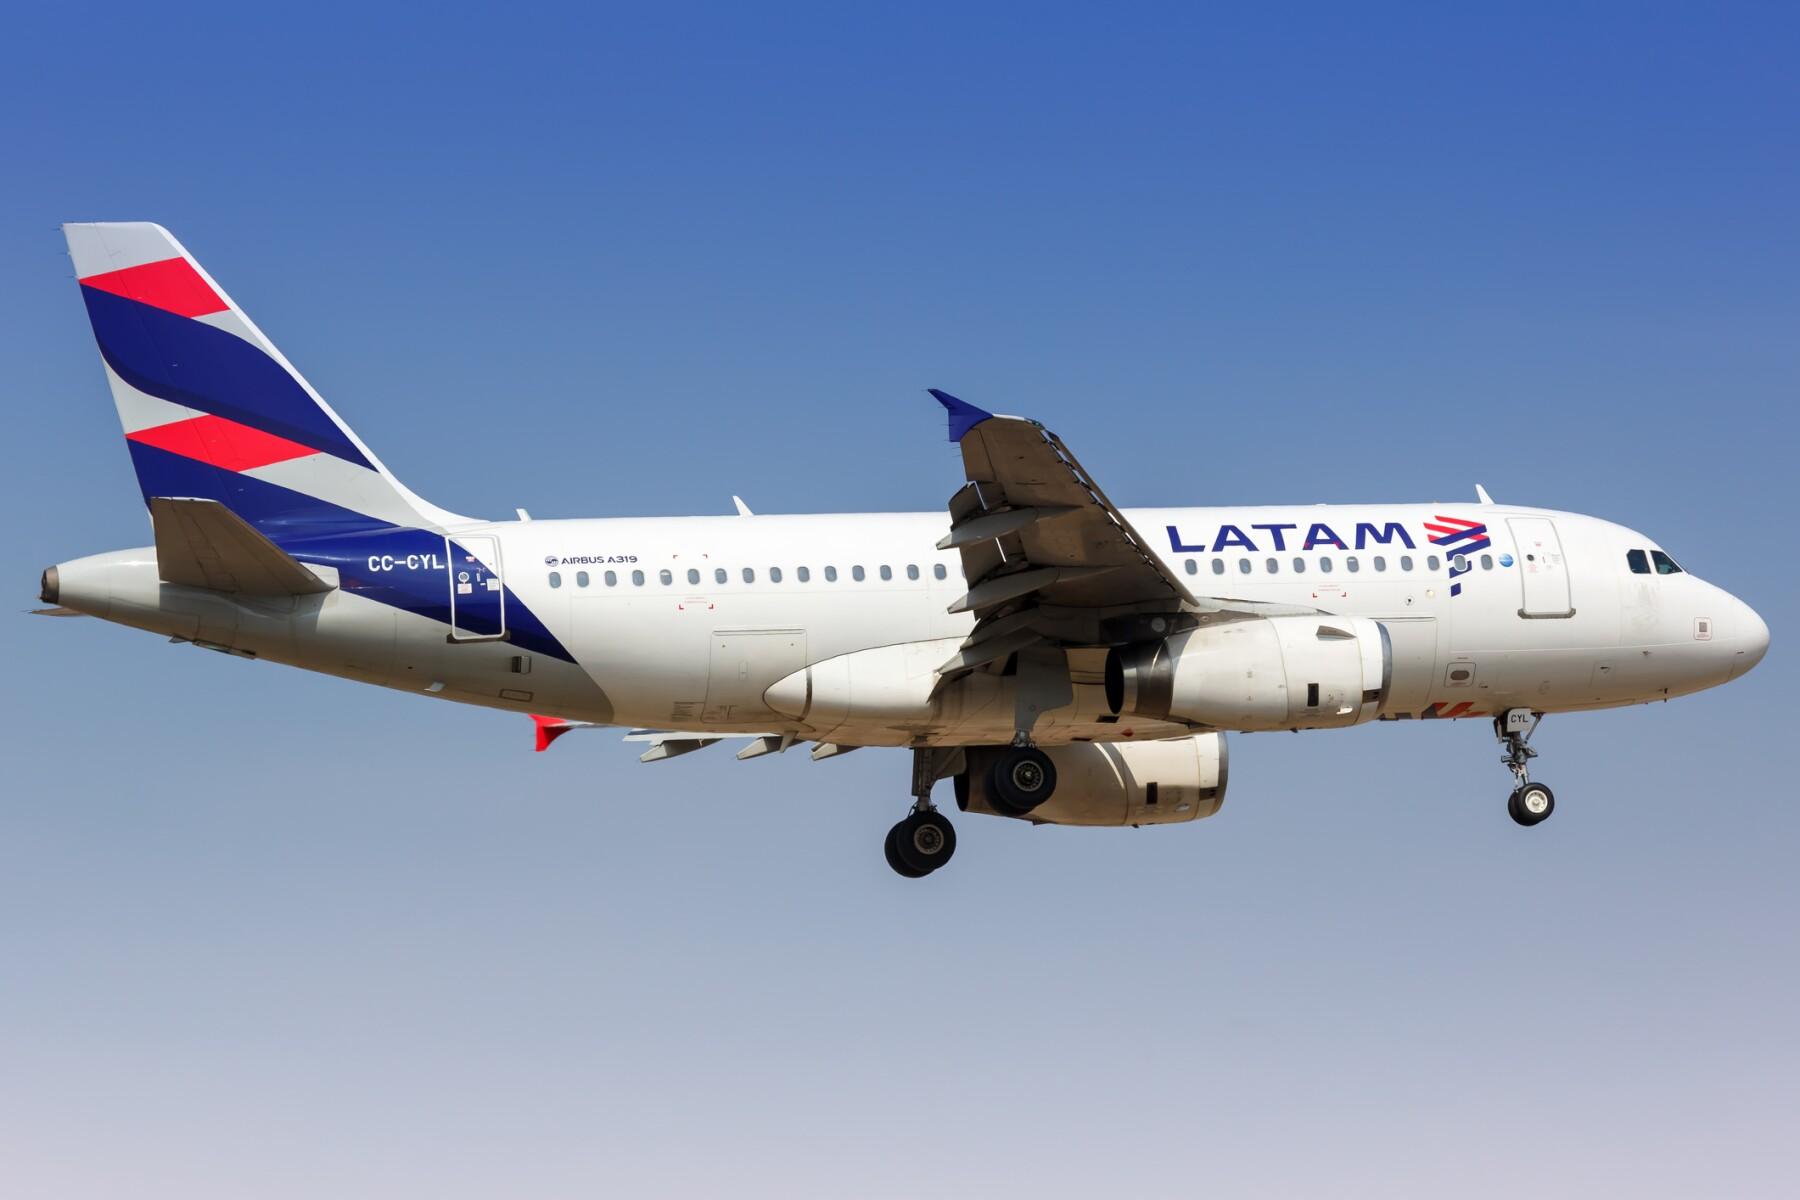 latam-airlines.jpg